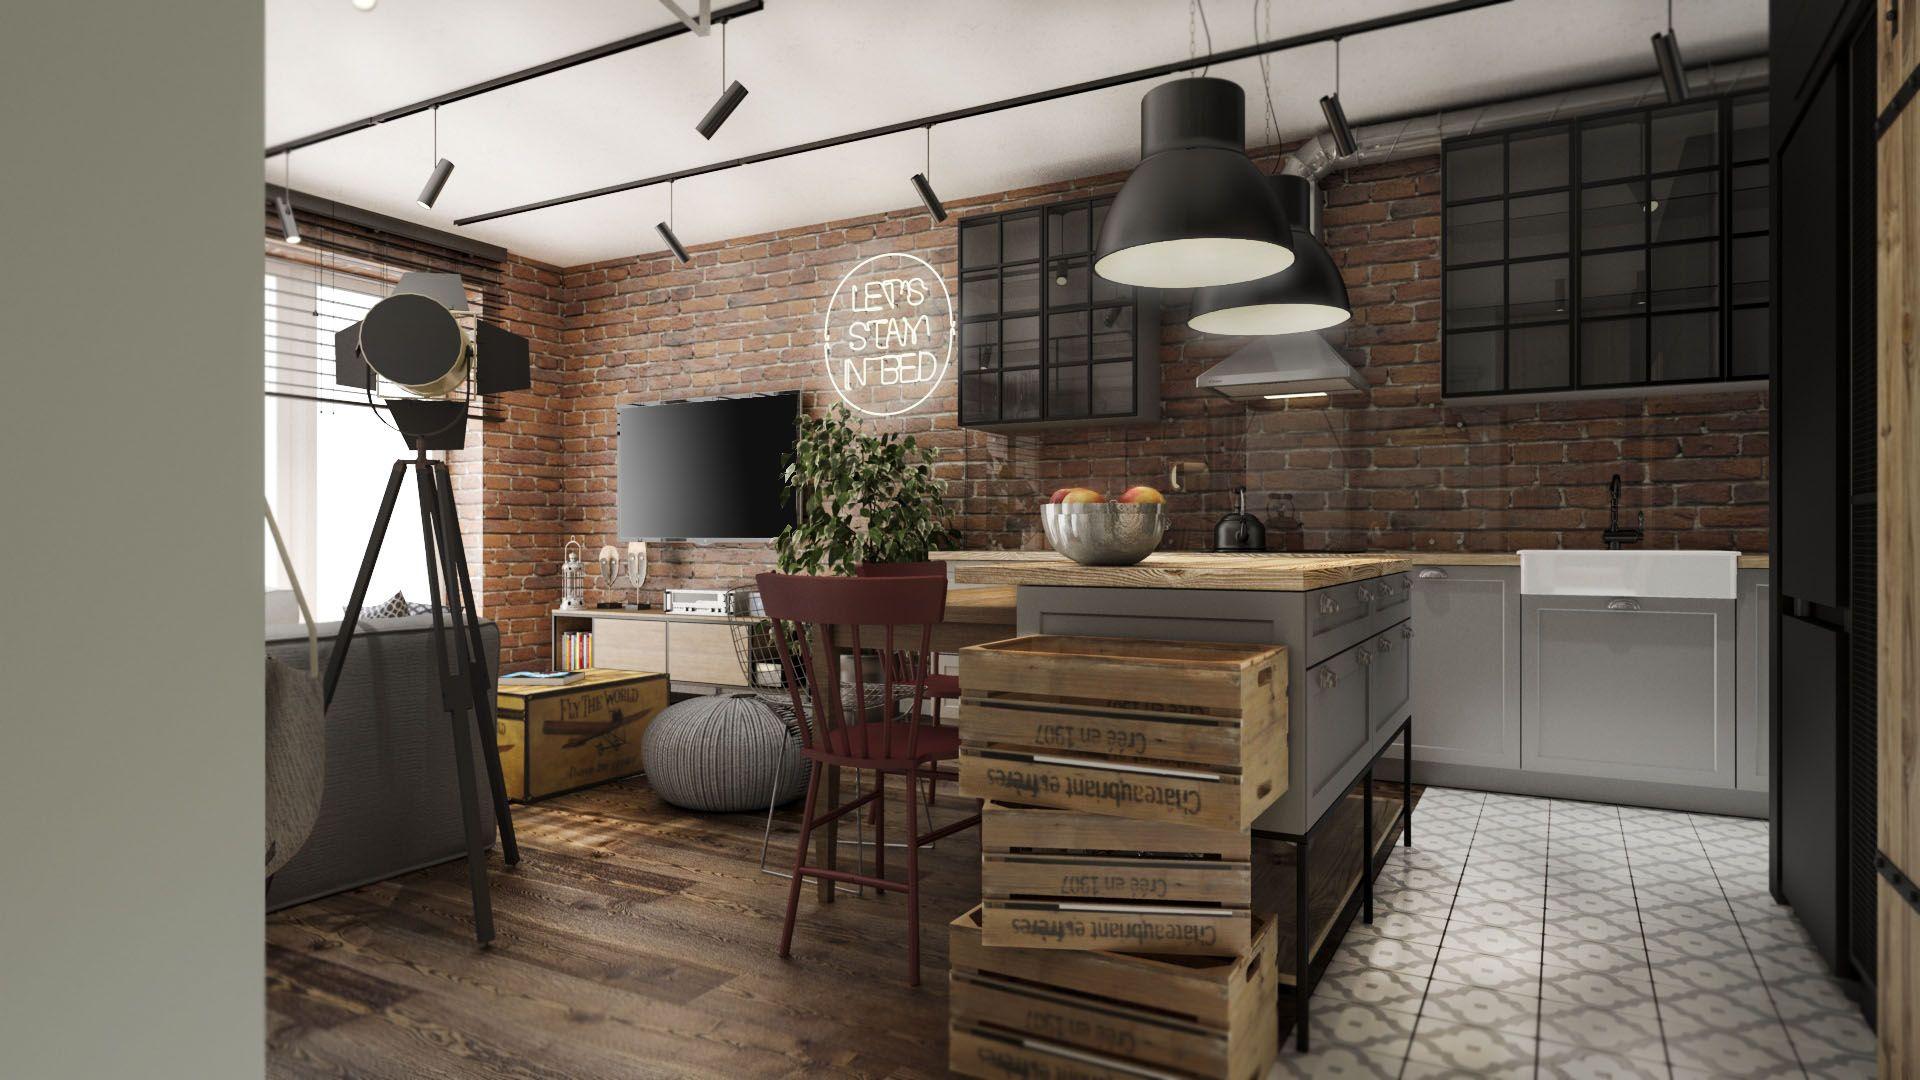 Kuchnia W Stylu Industrialnym Interior Design Interior Home Decor